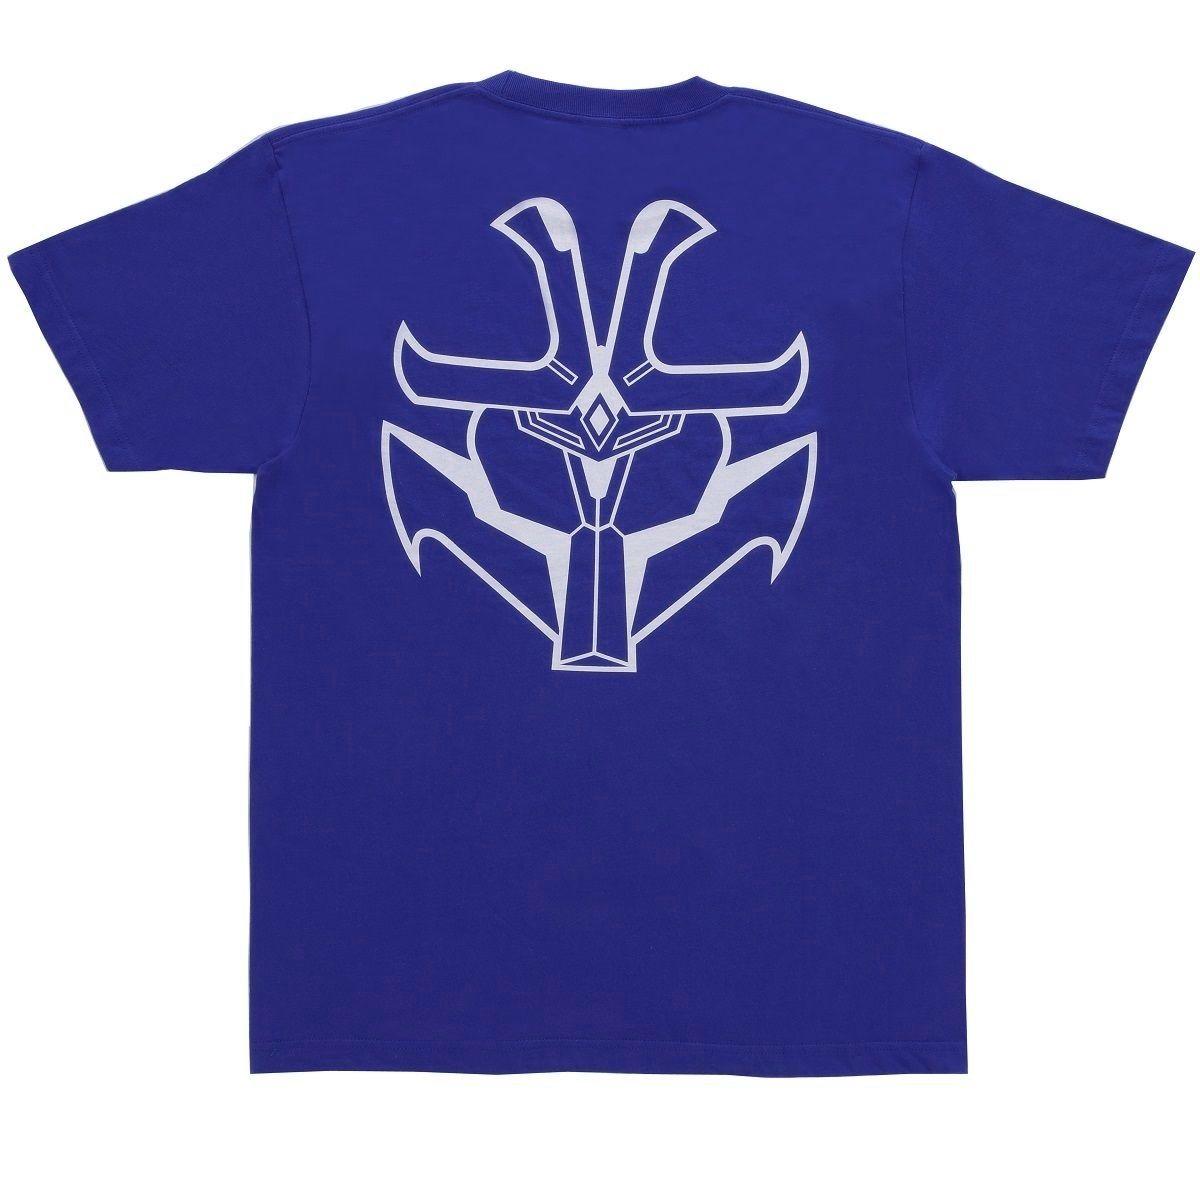 Keisuke Nago 753 T-shirt—Kamen Rider Kiva